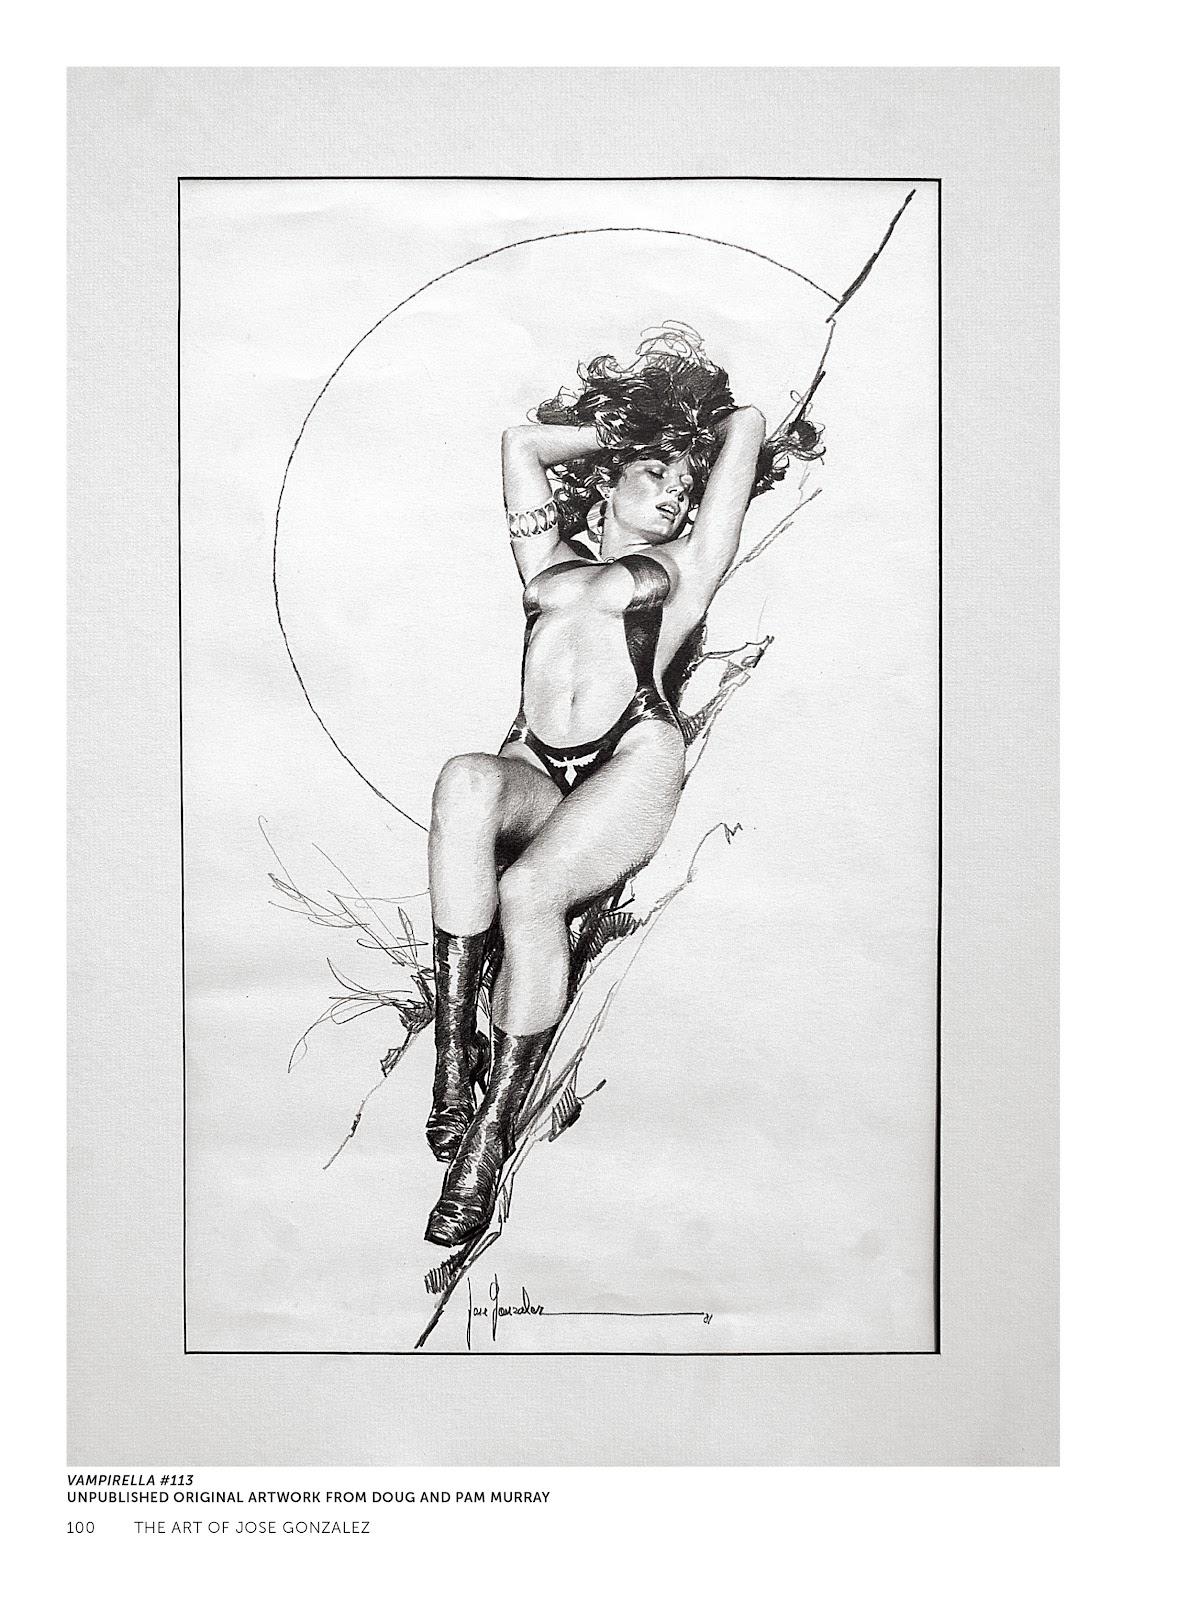 Read online The Art of Jose Gonzalez comic -  Issue # TPB (Part 2) - 2